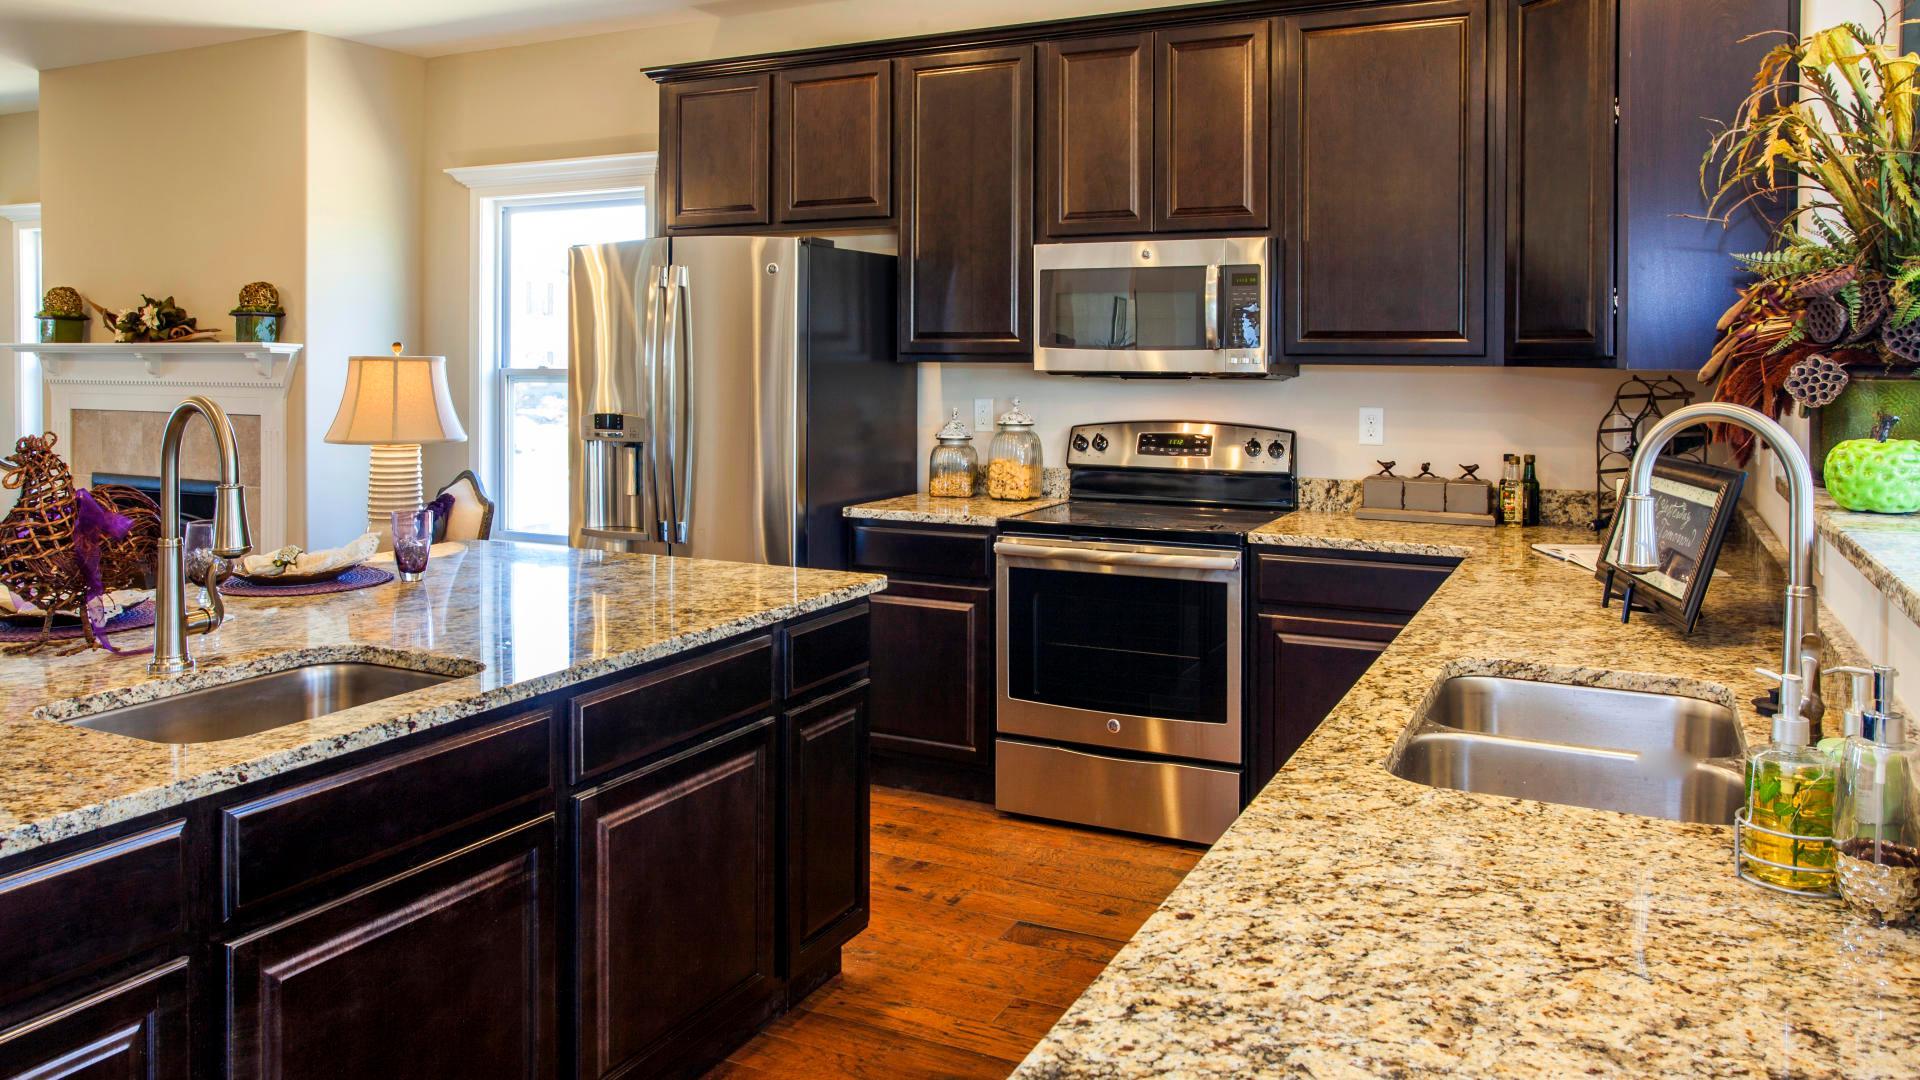 Kitchen featured in the Newbury By Maronda Homes in Cincinnati, OH